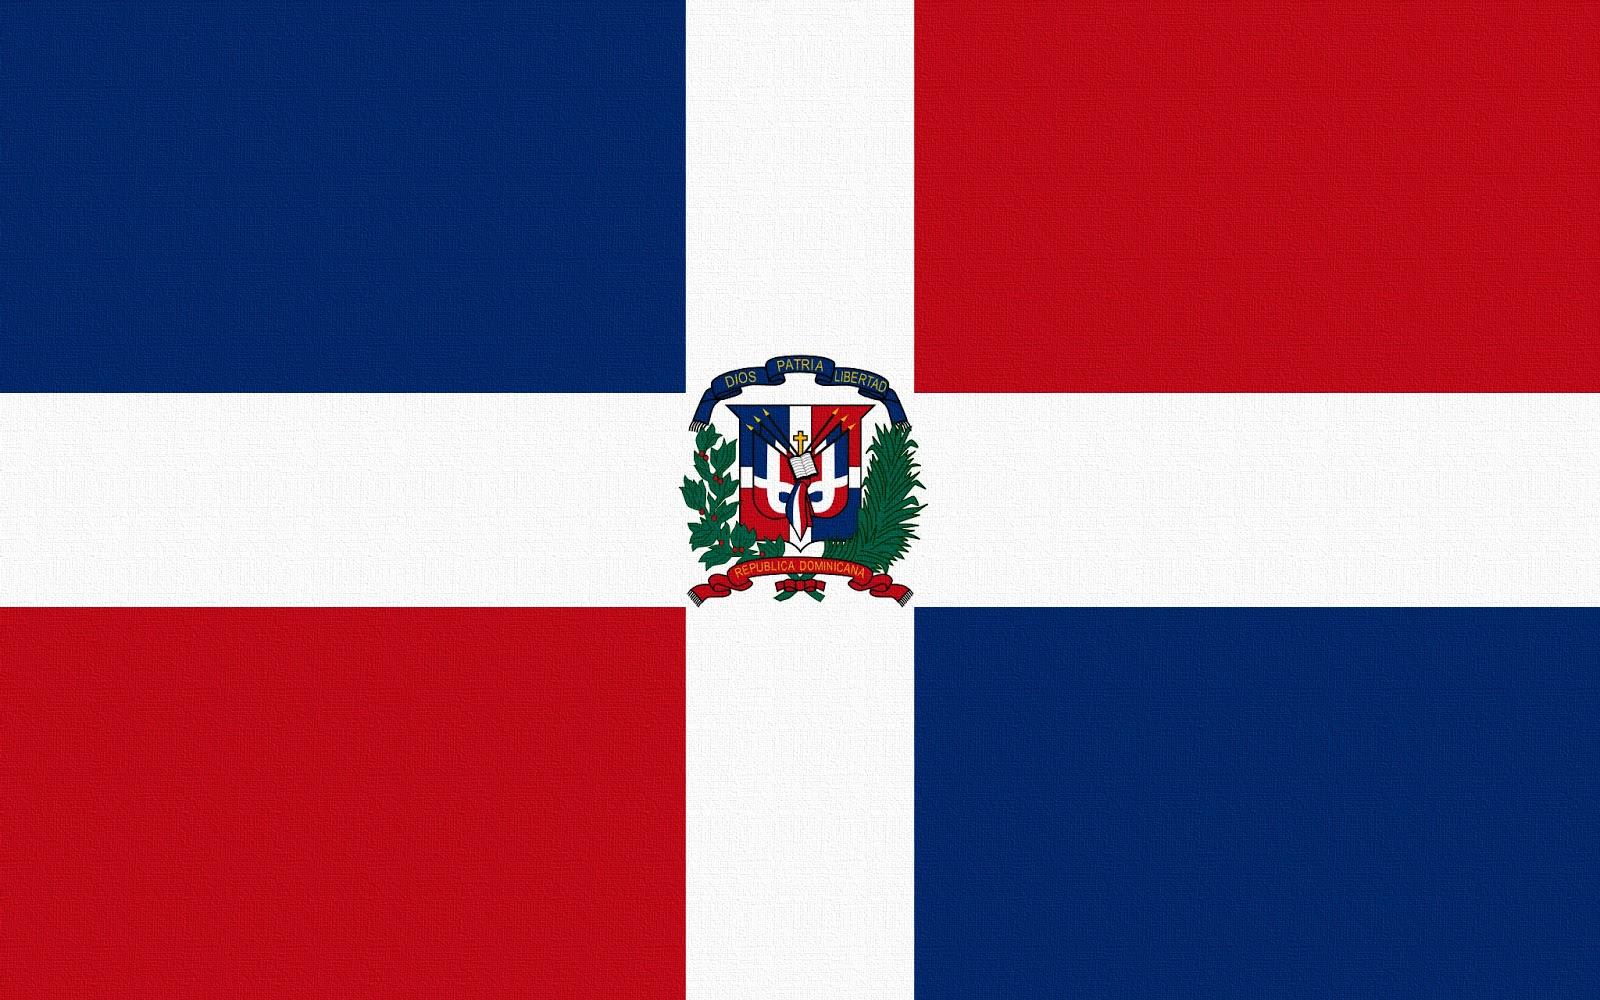 http://1.bp.blogspot.com/-Gyaso-f2y3c/UPtF4ZudfLI/AAAAAAAA0hc/2yHIglOfqbs/s1600/Flag-Dominican-Republic-Wallpapers_Fondos-de-Pantalla-Bandera-Republica-Dominicana.jpg